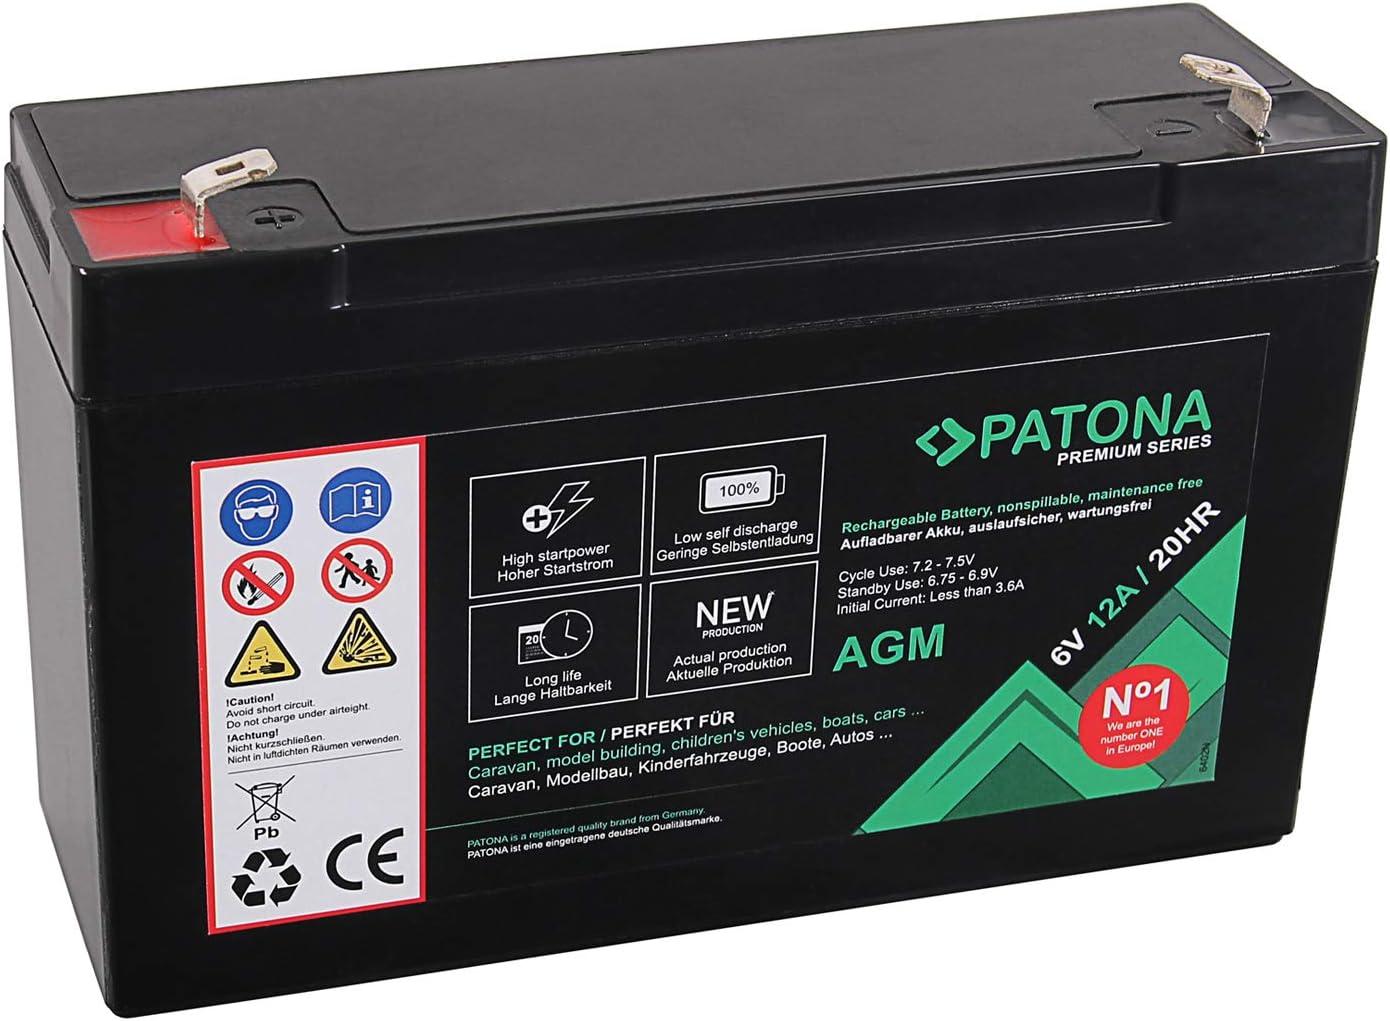 Patona Premium AGM 6V 12Ah Lead Battery VRLA Maintenance-Free 1800 Cycles